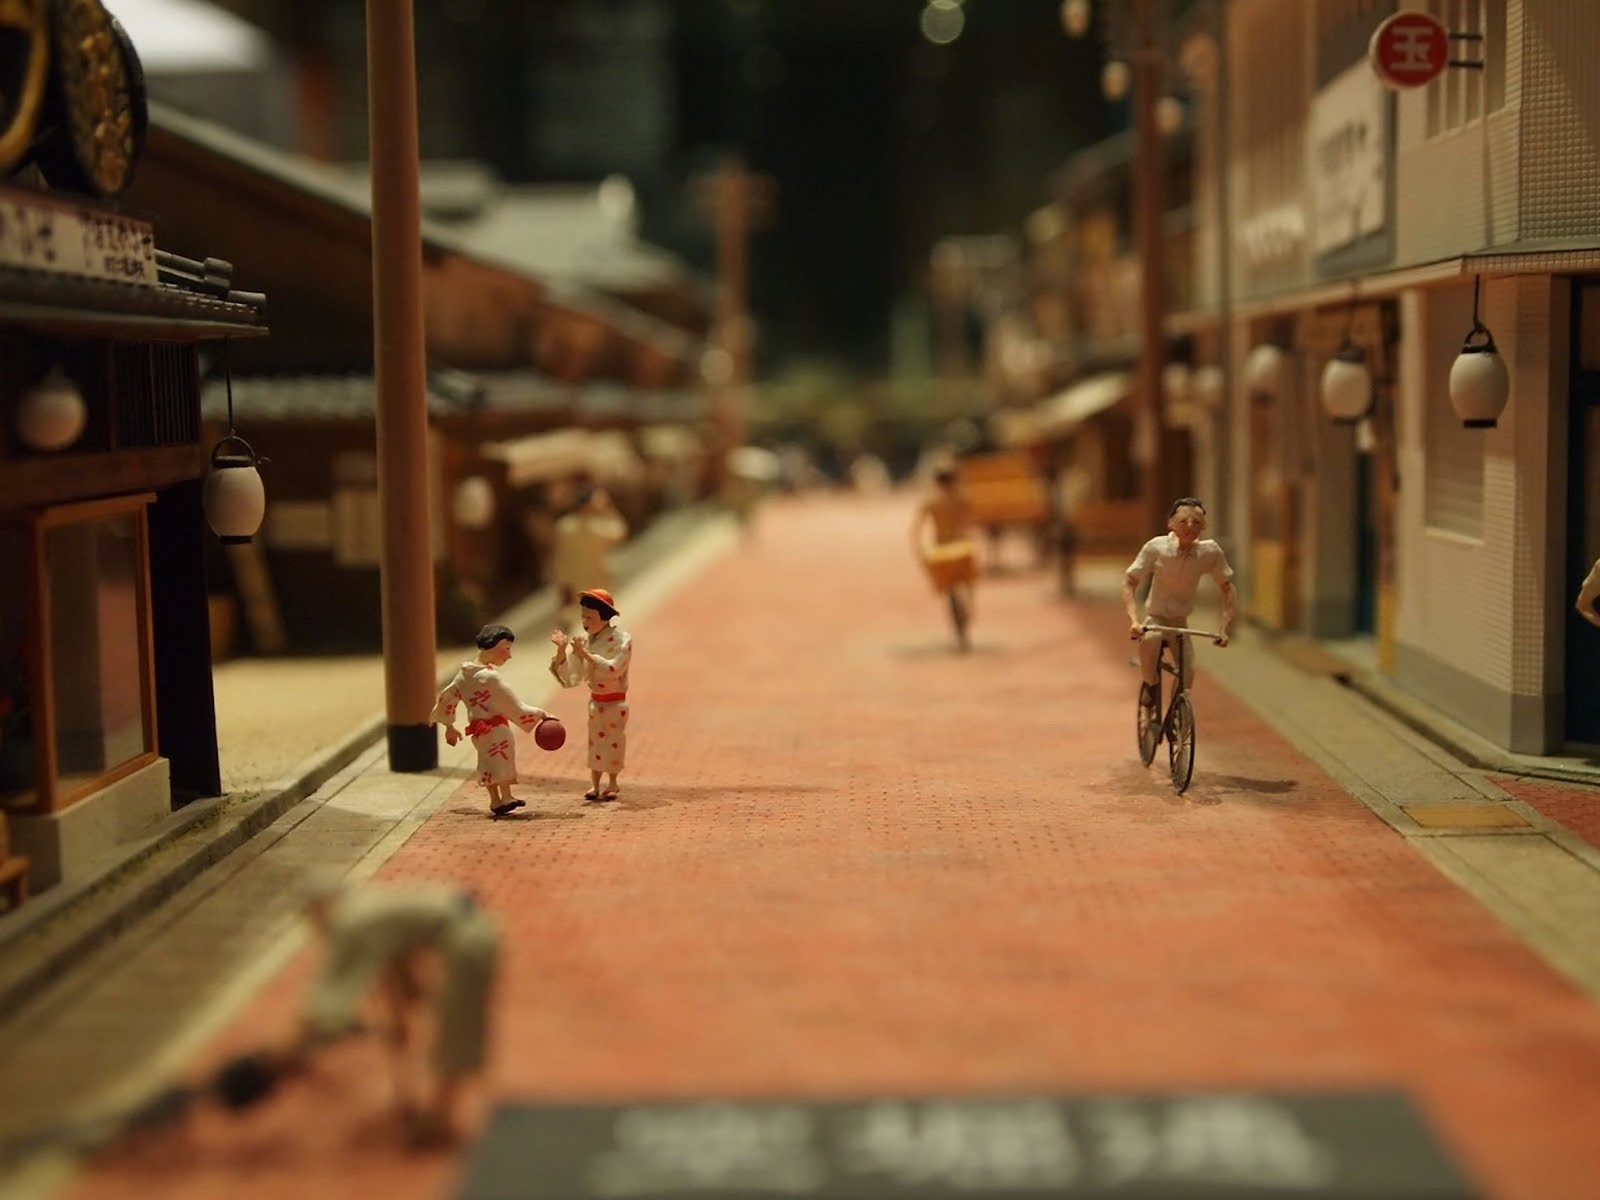 miniature street